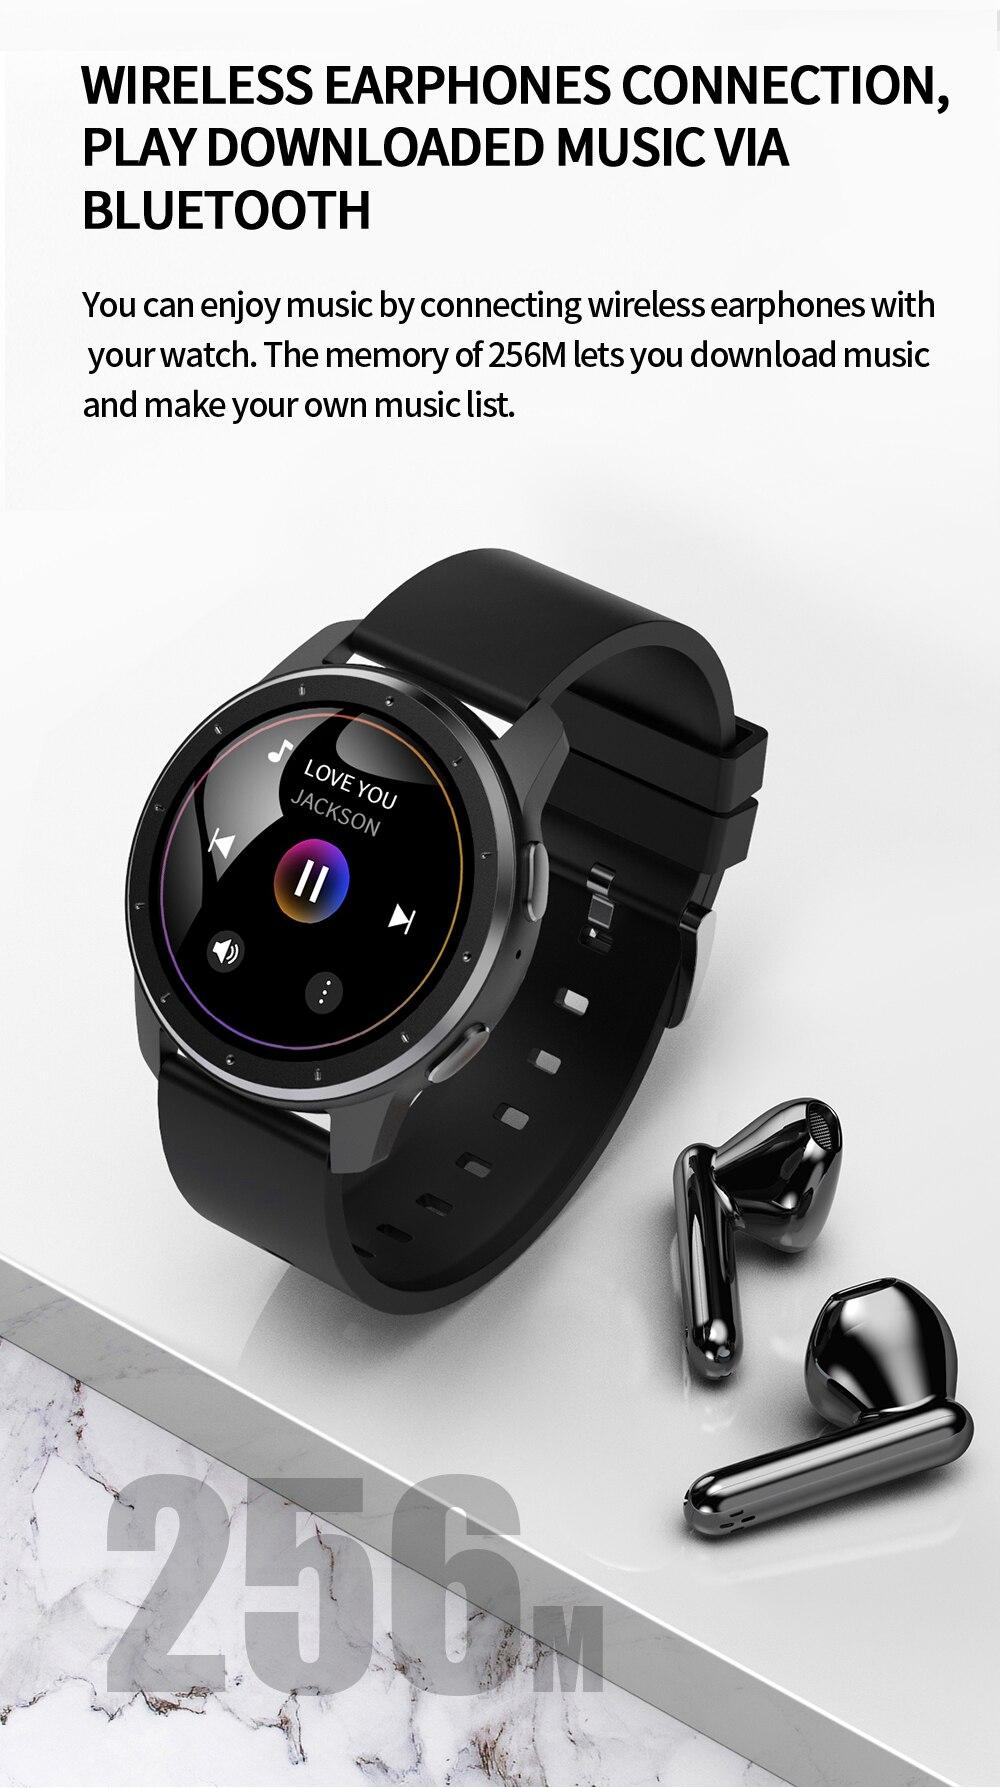 696 mx11 mulheres relógio inteligente 2020 chamada